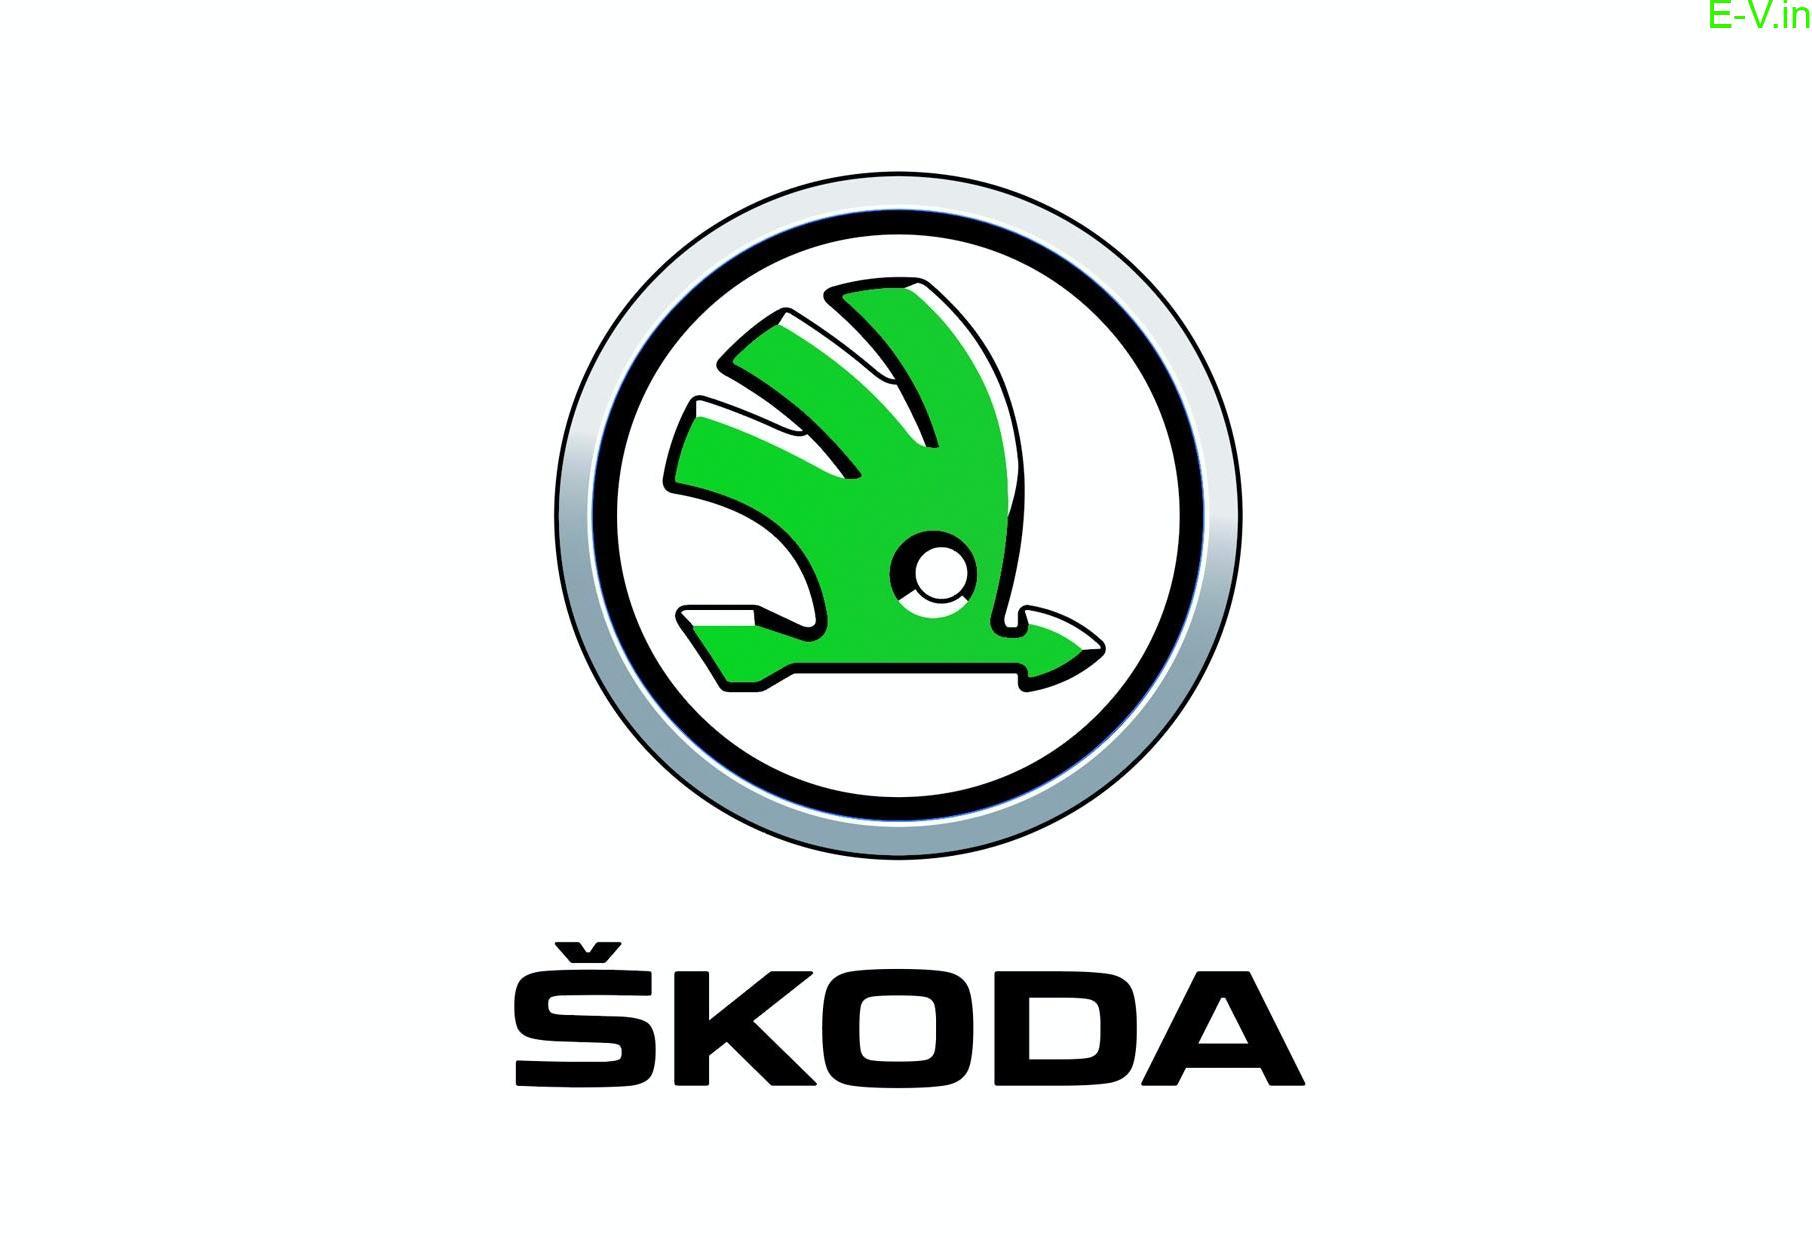 Skoda joins EV Experience Centre press release